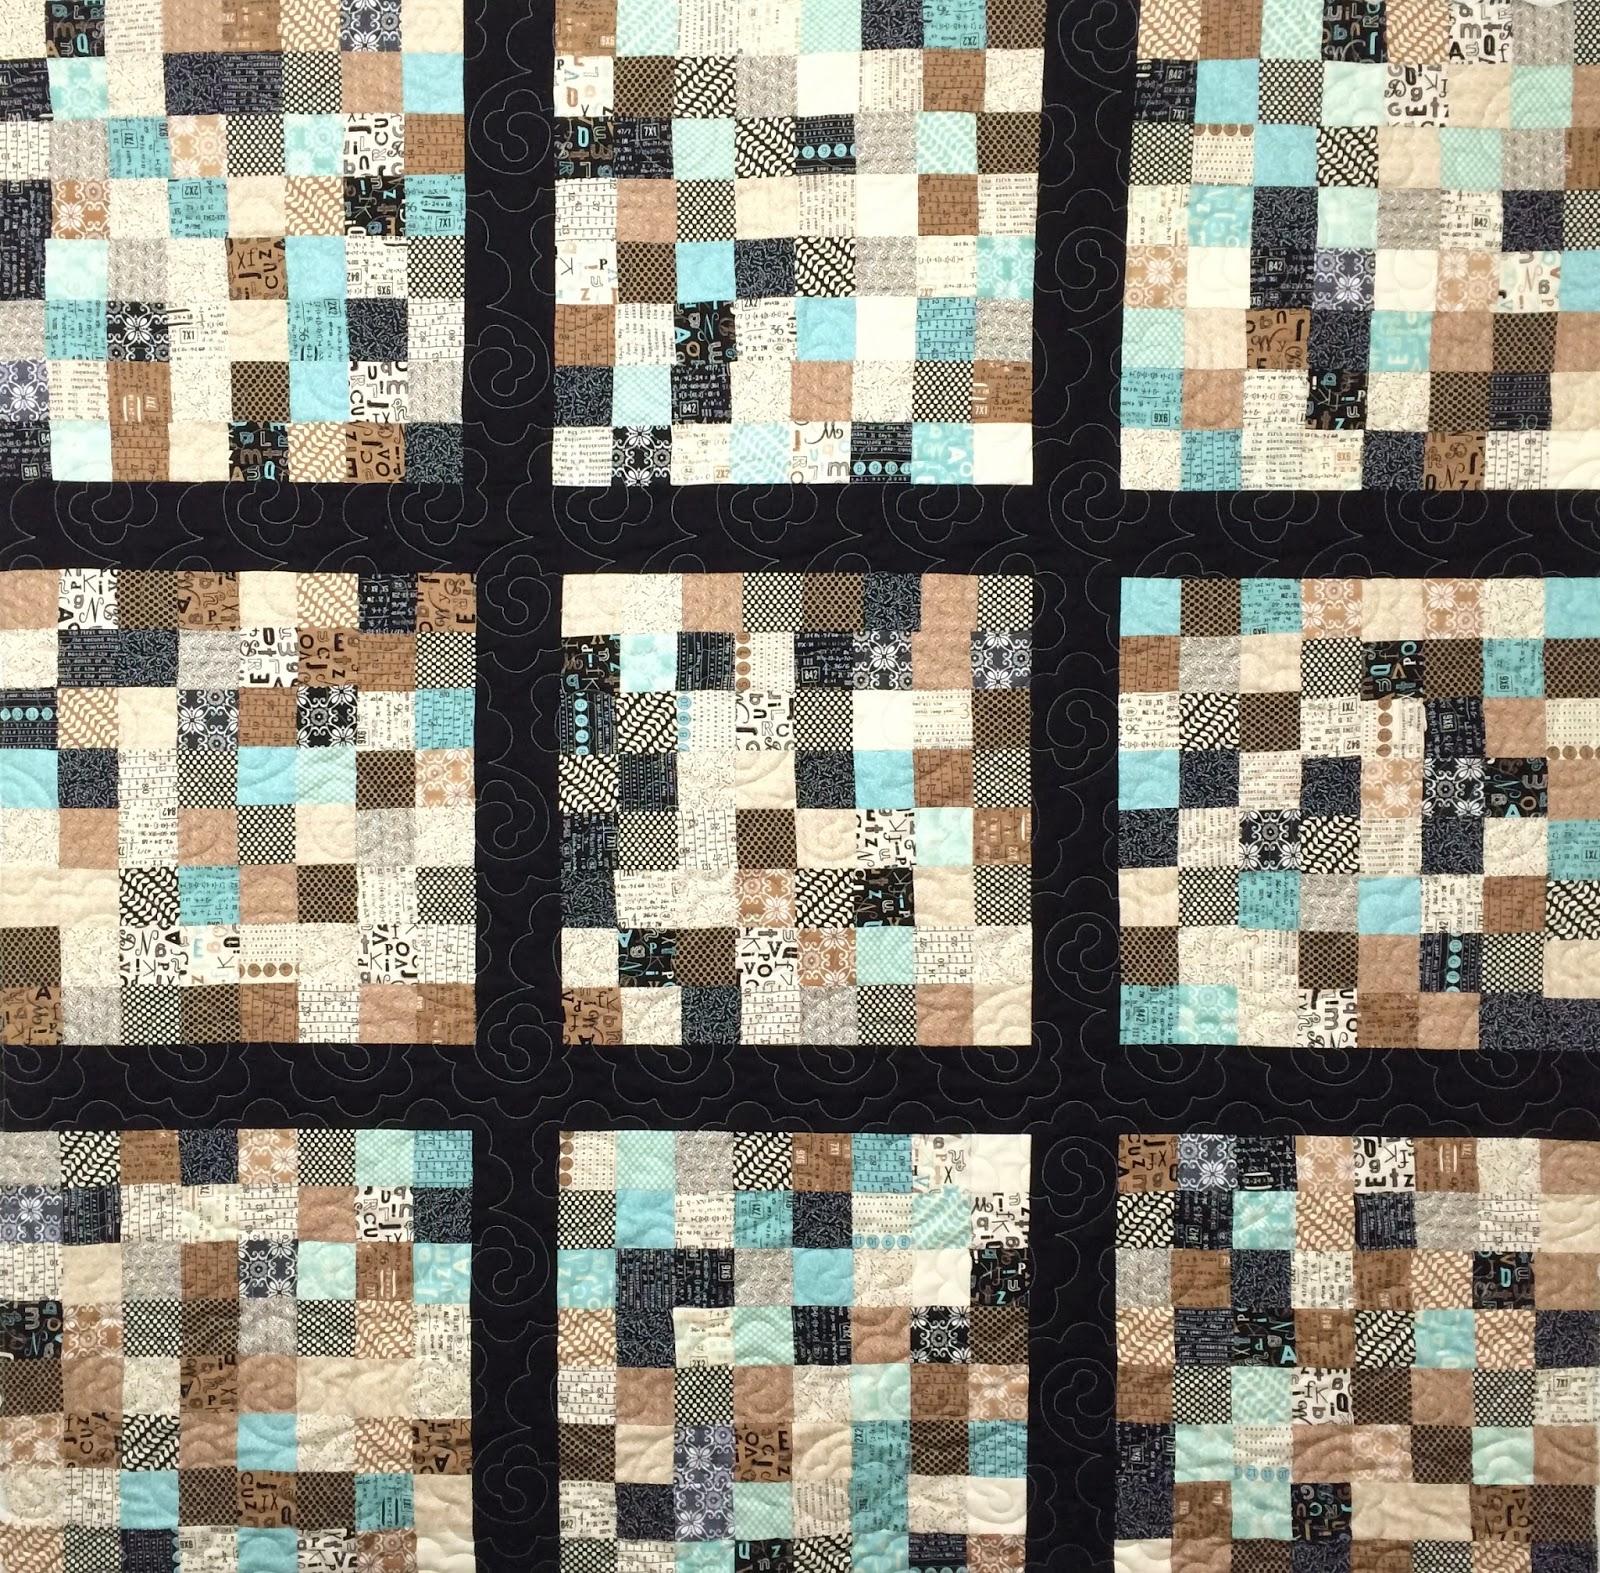 Codi Mangrum's Elementary Quilt